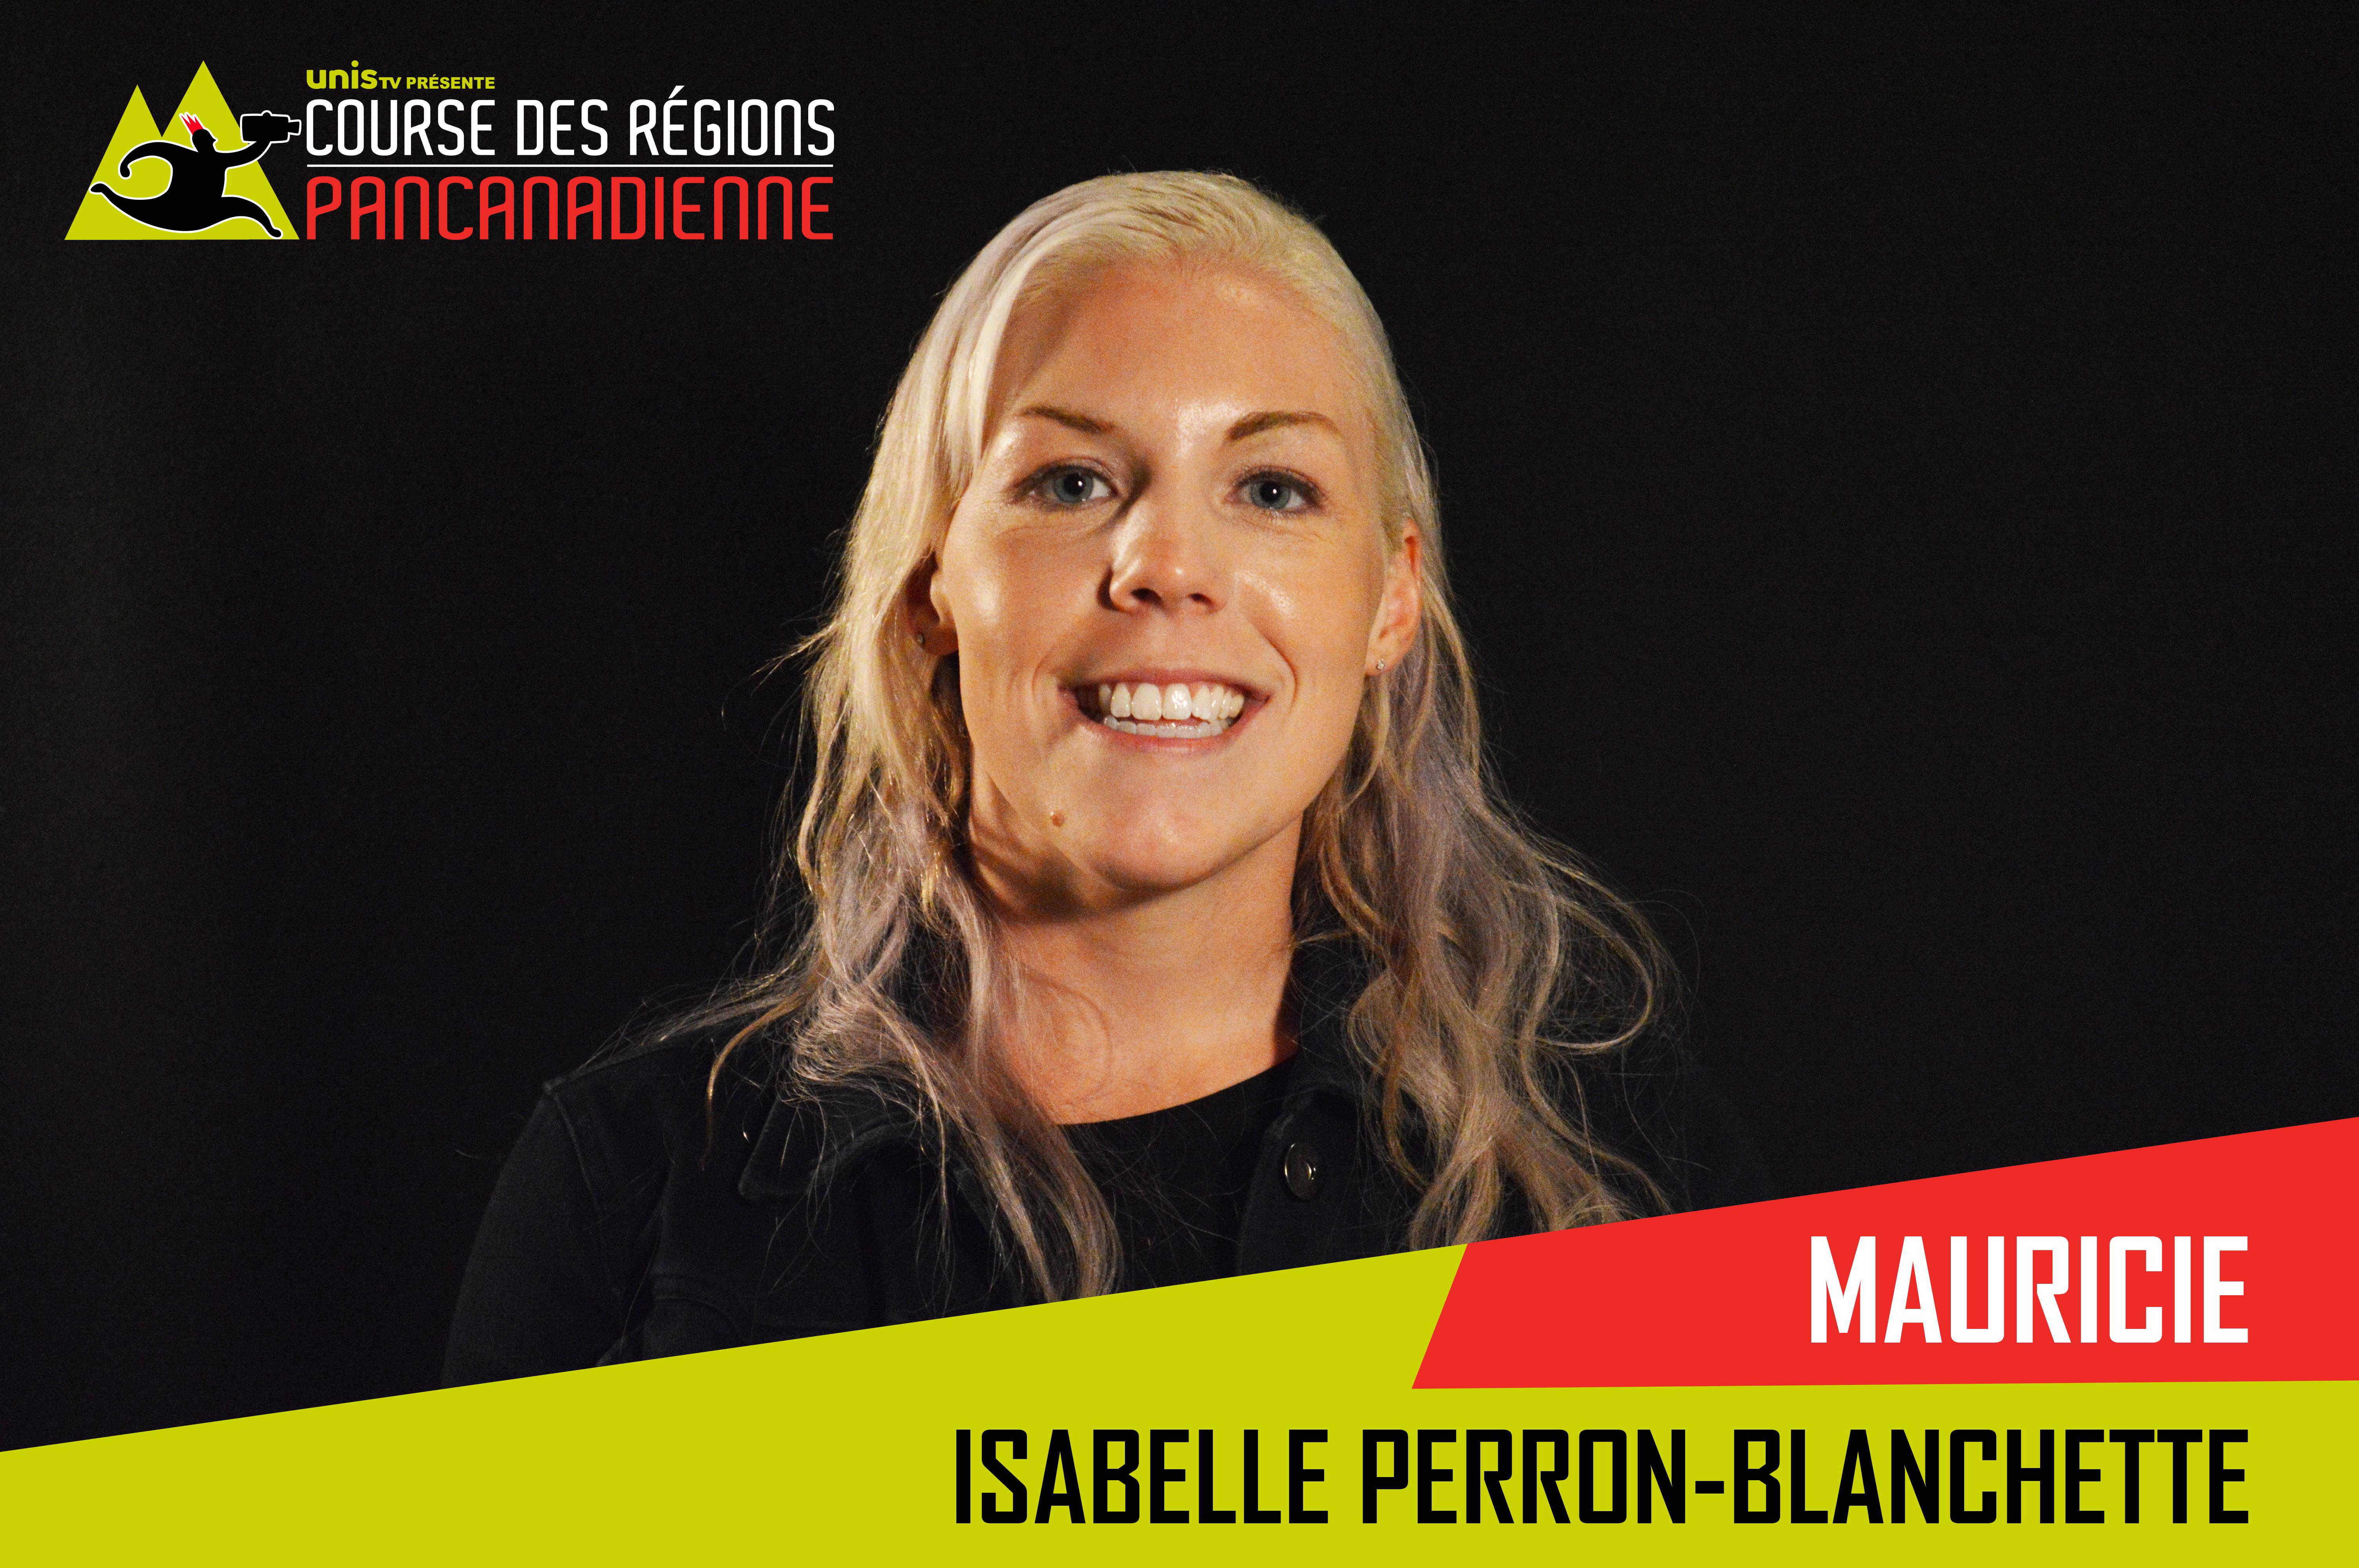 1. Isabelle Perron-Blanchette